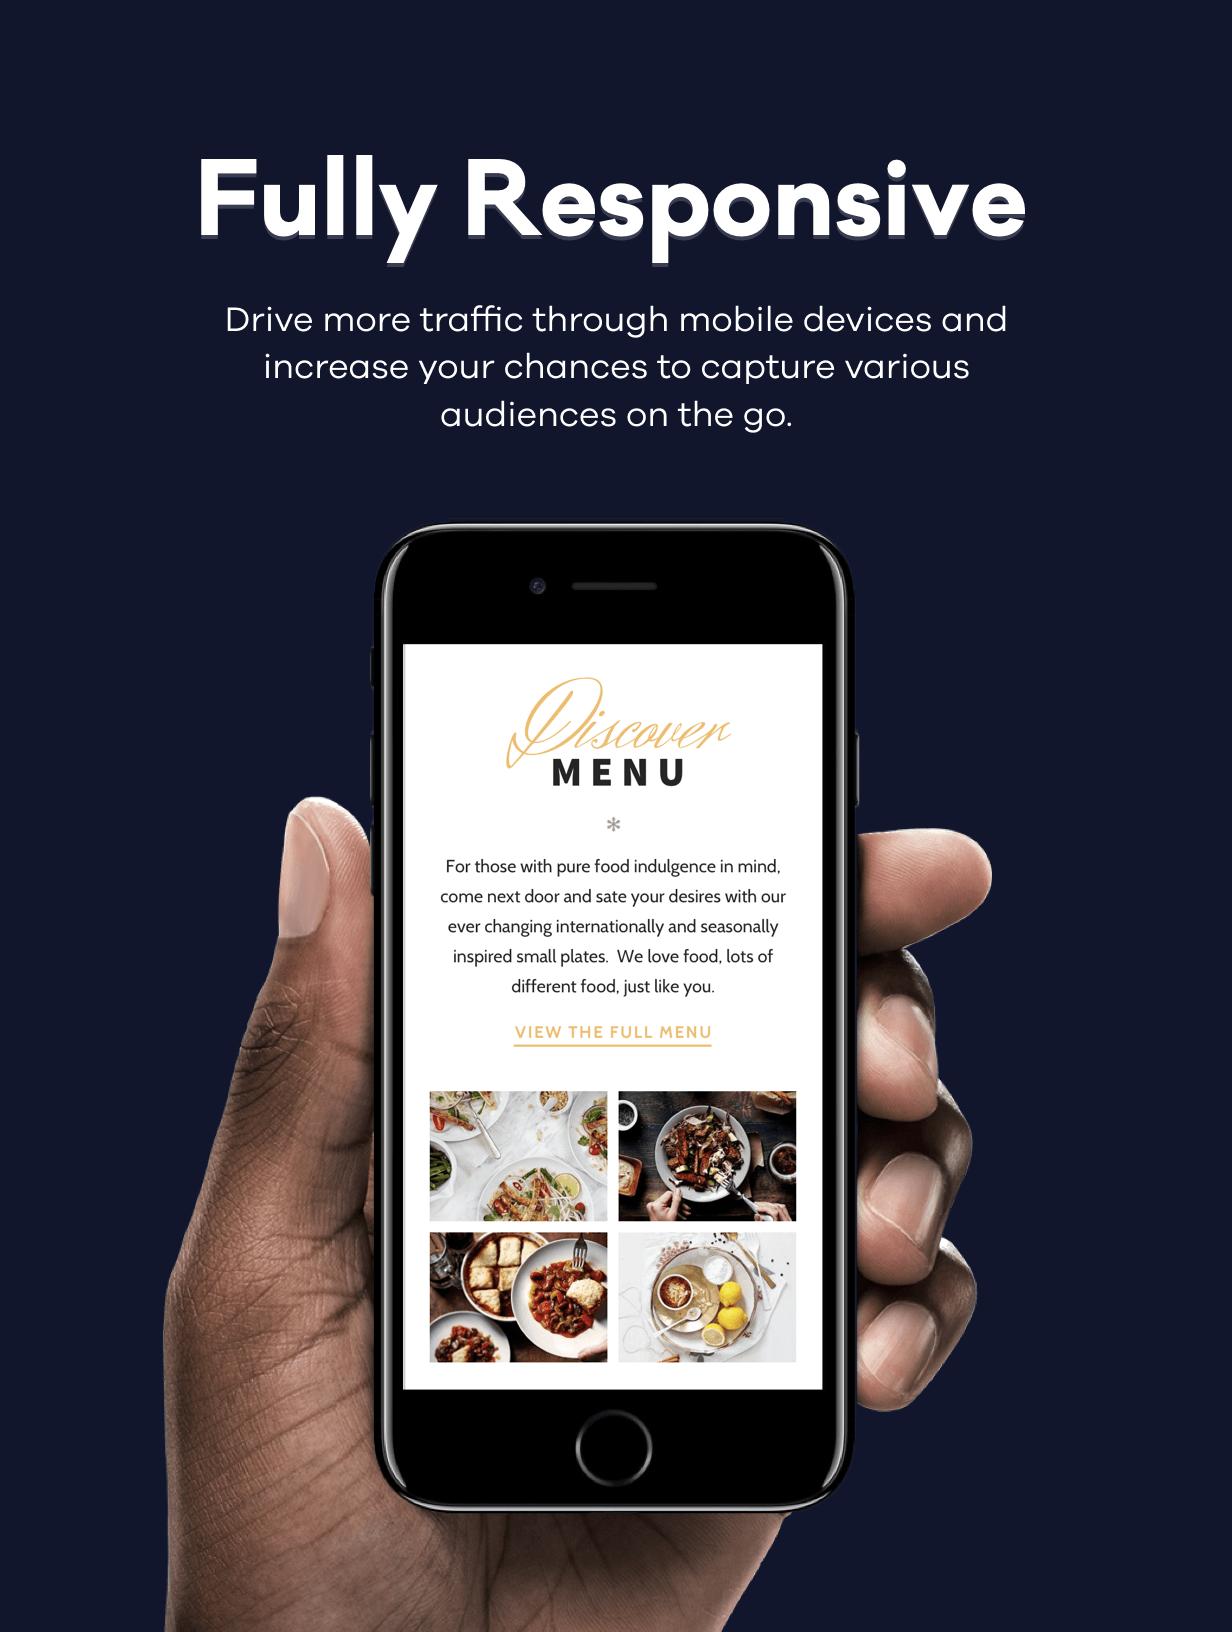 rosa responsive - ROSA 1 - An Exquisite Restaurant WordPress Theme